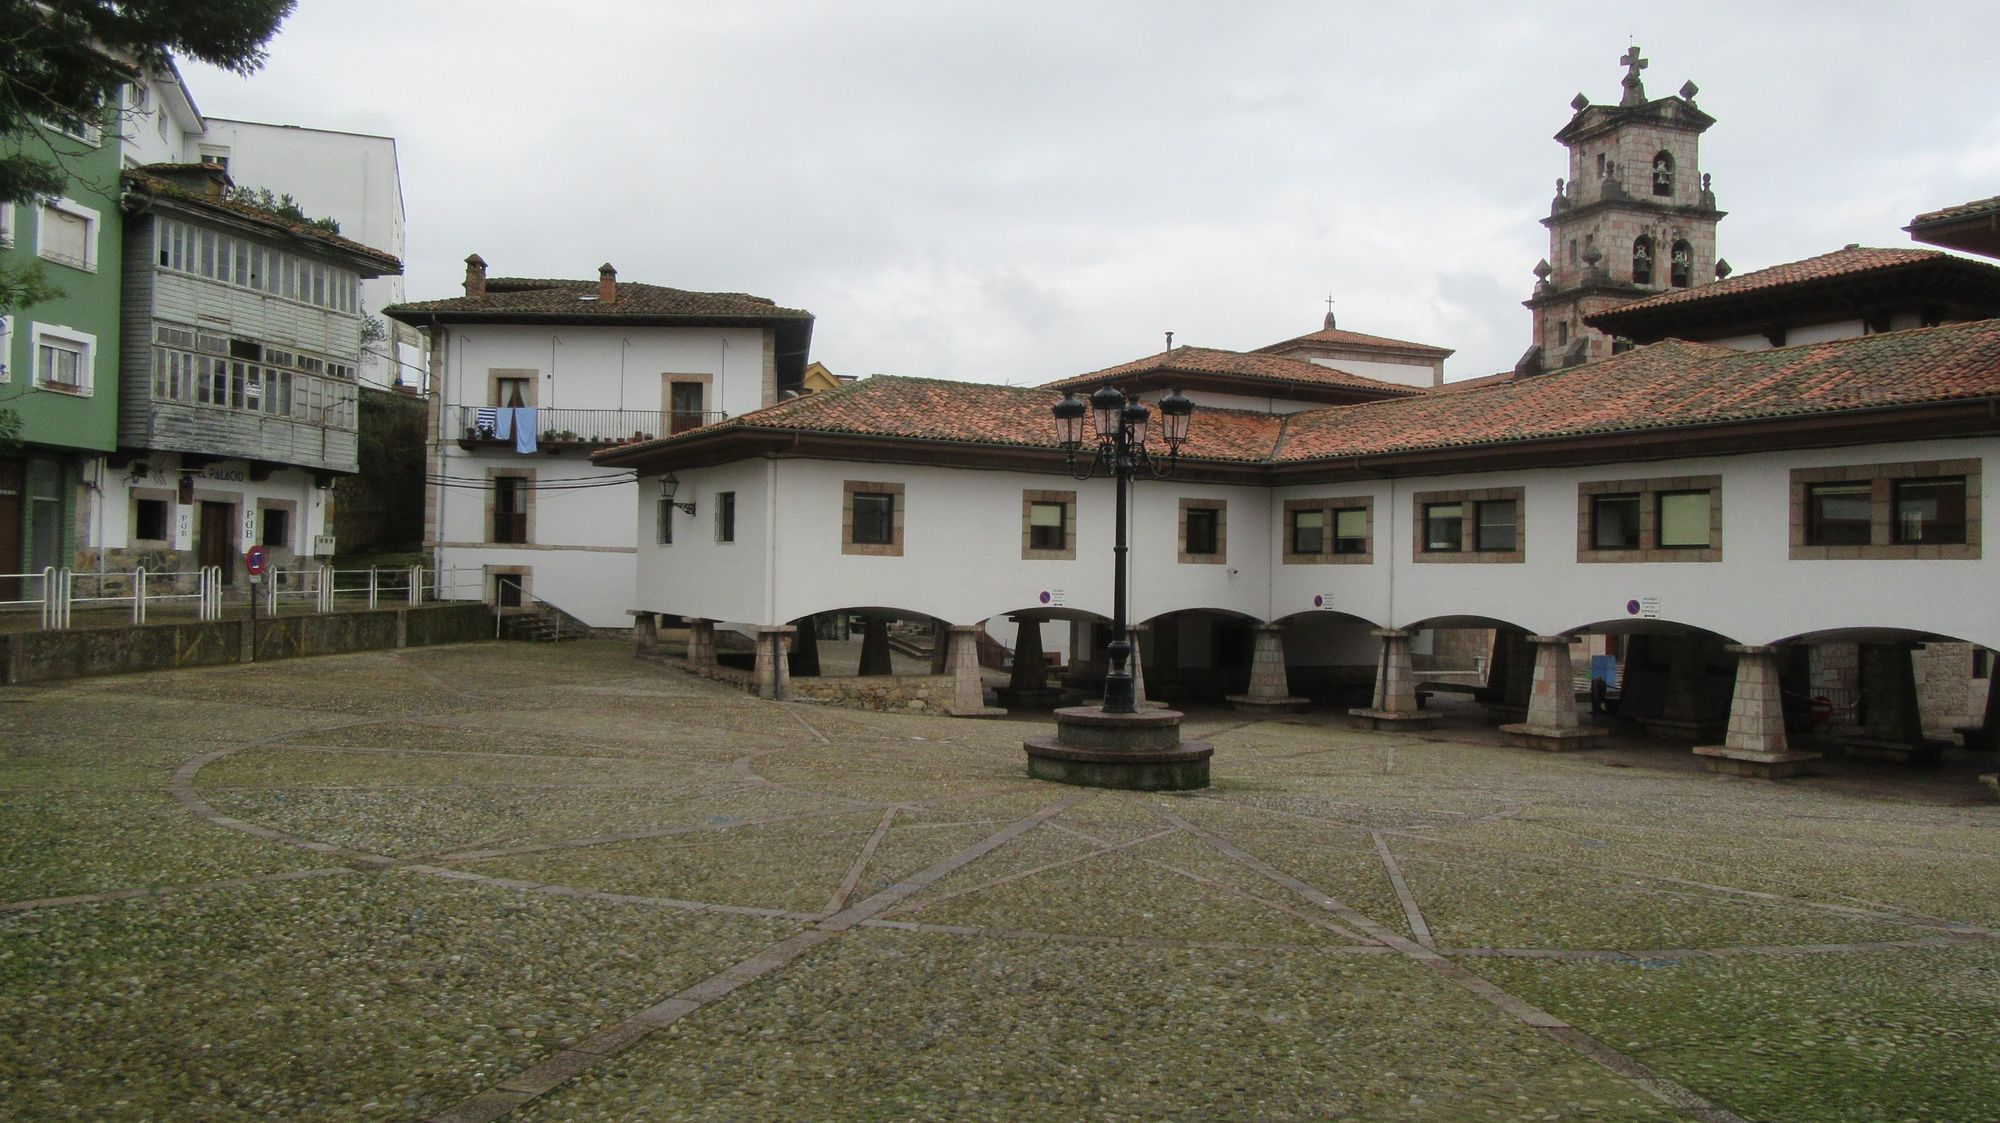 Plaza Cangas de Onís vacía. Carbajal.JPG